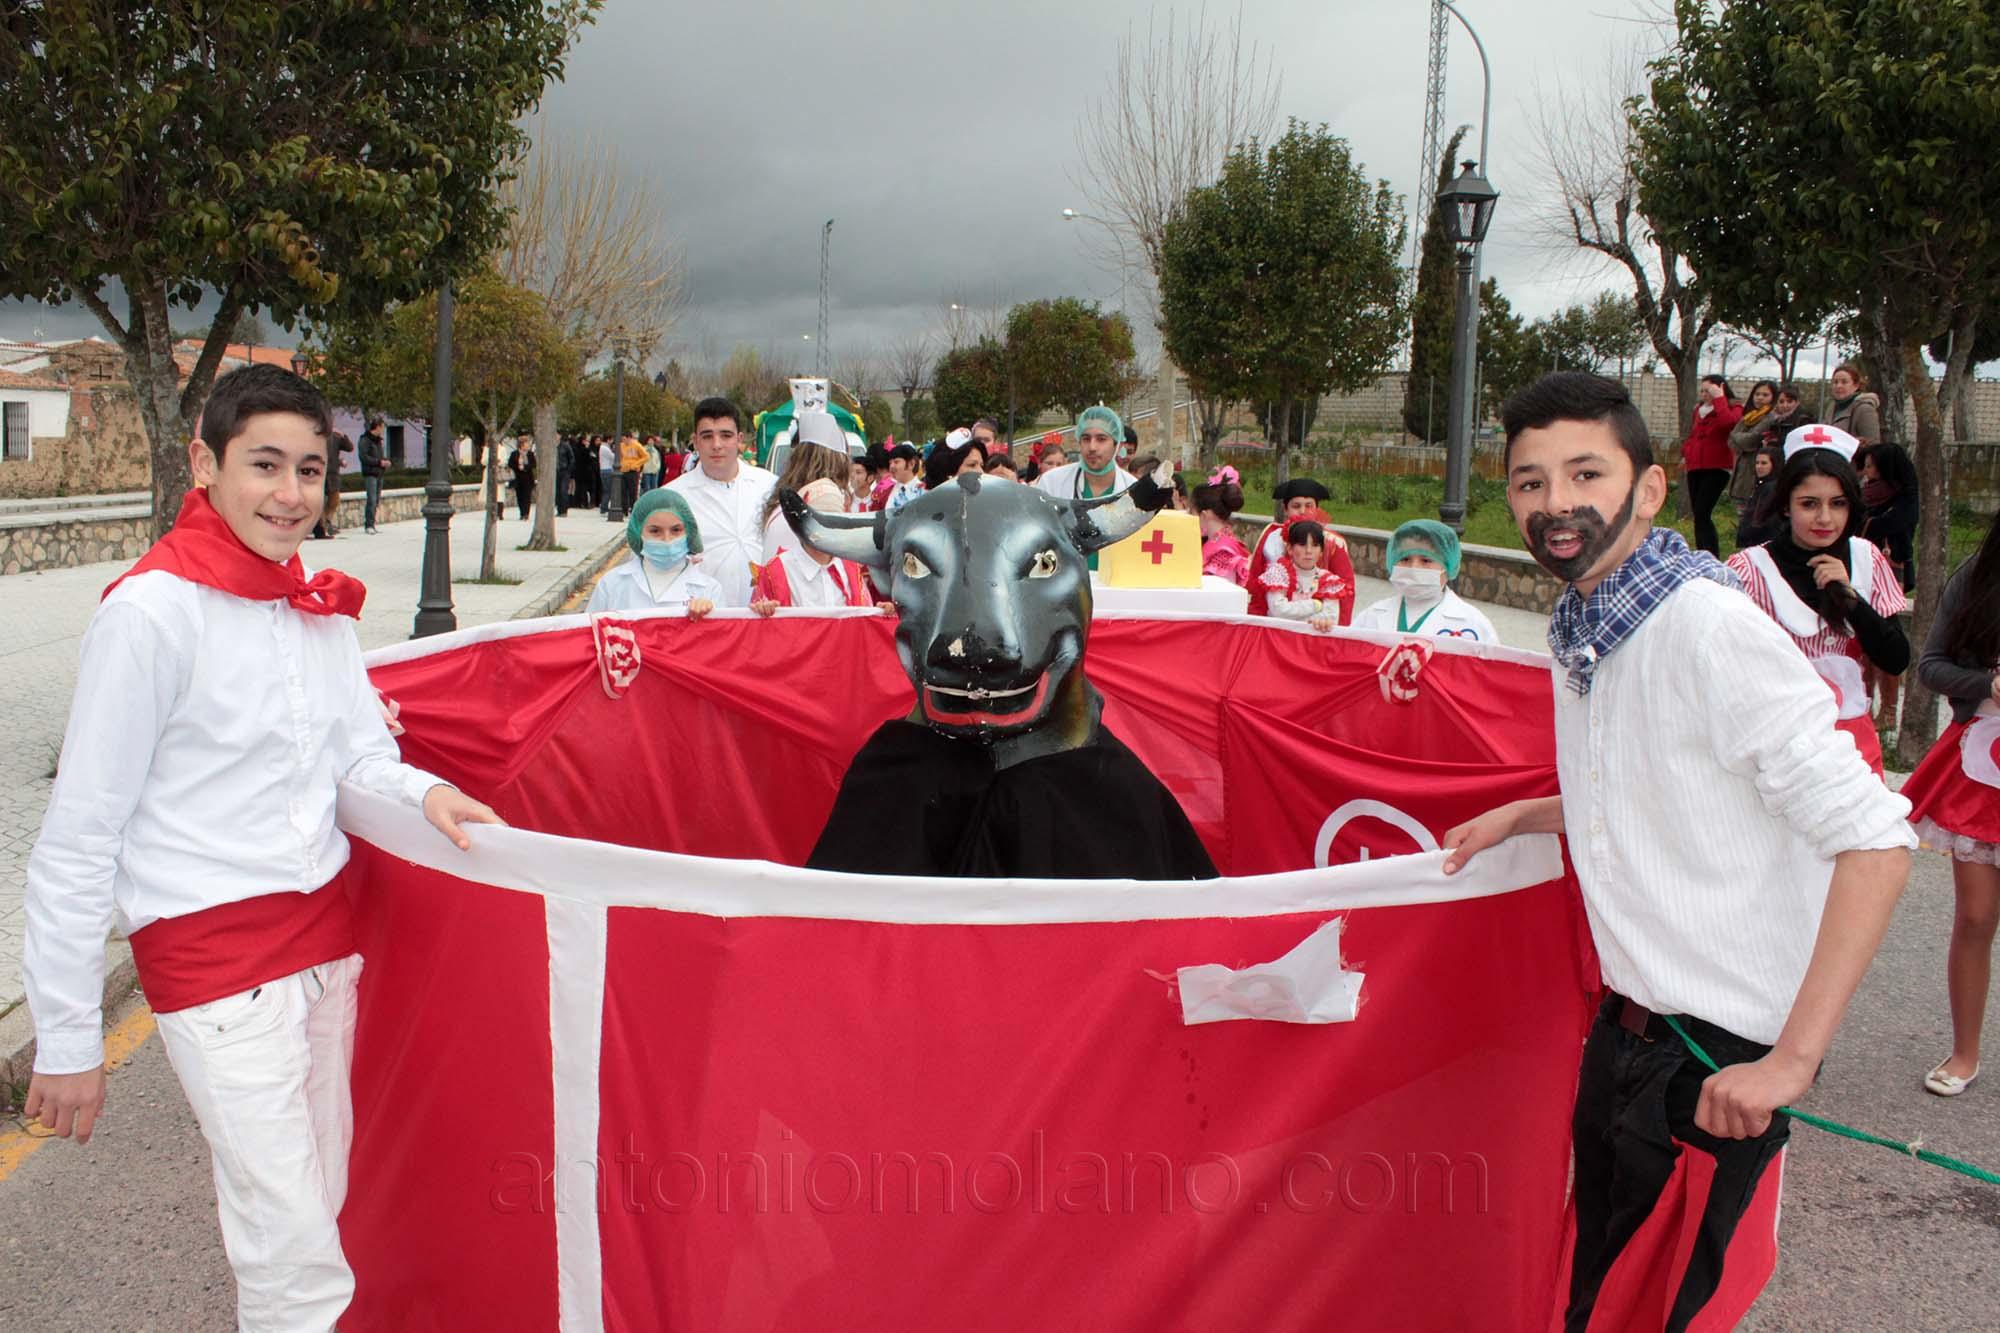 carnaval 2014 - 4.jpg